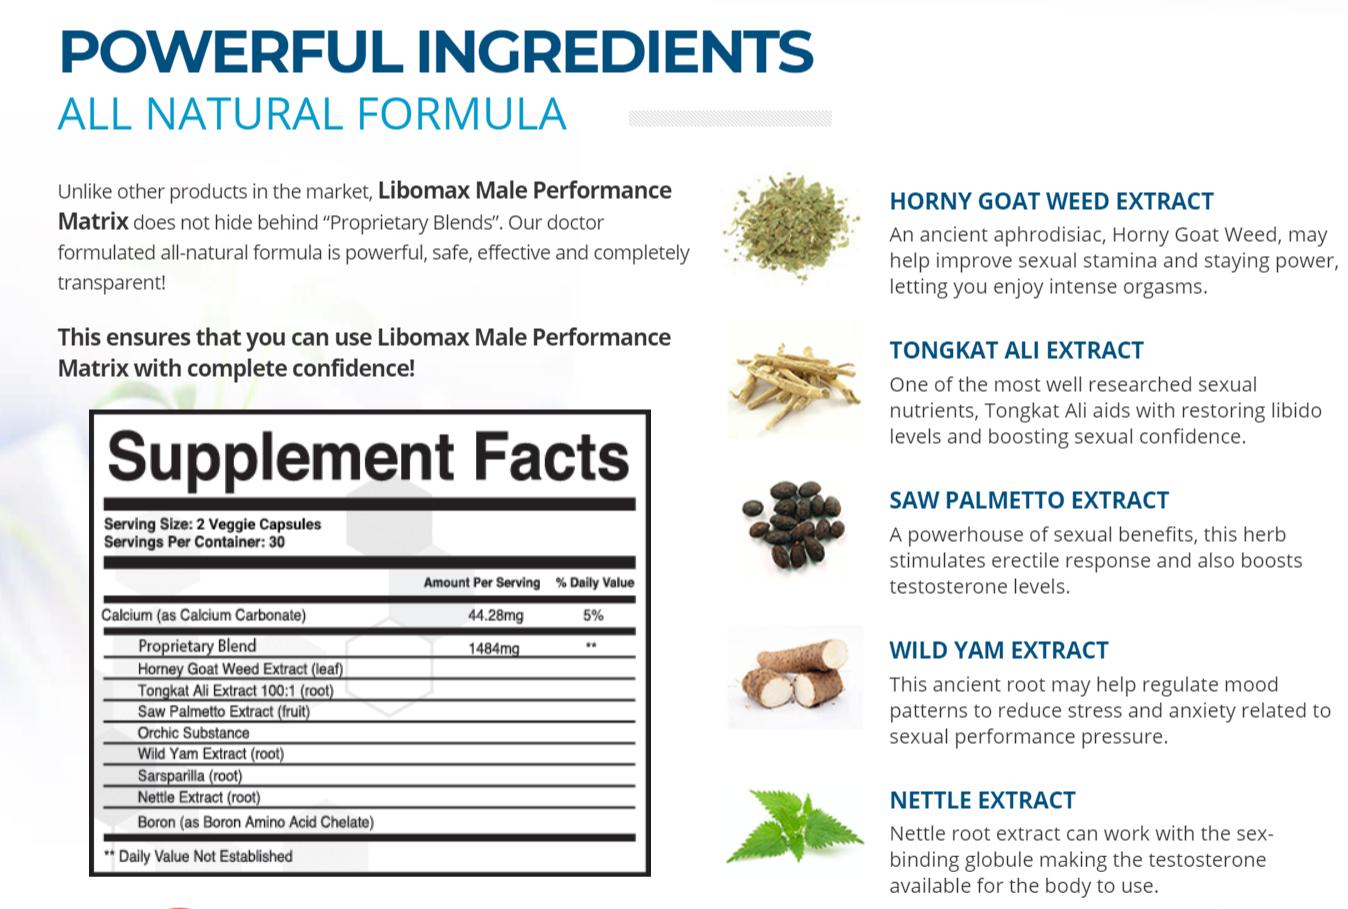 libomax ingredients label